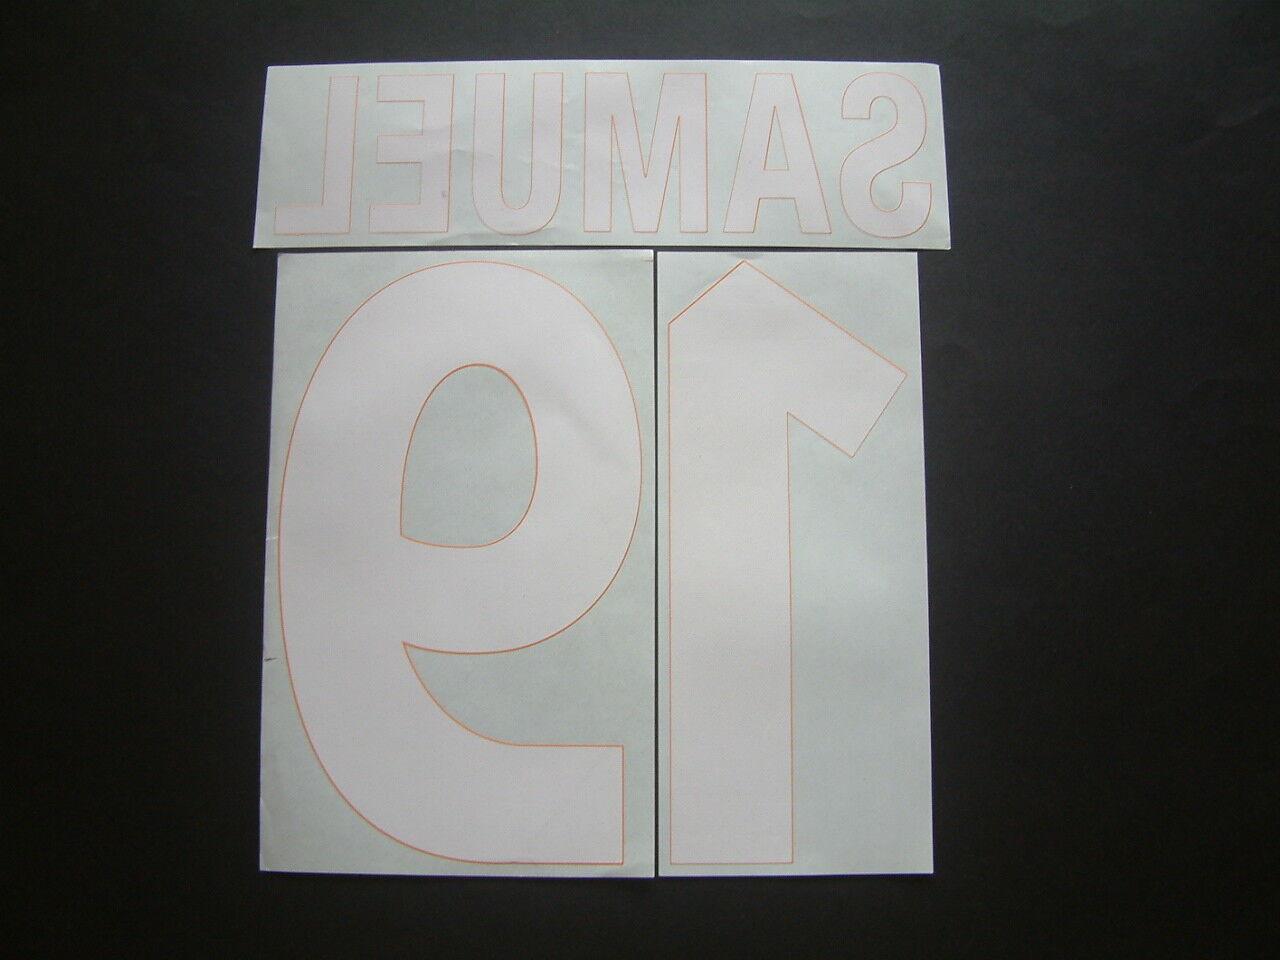 Name + Nummer offizielle AS ROMA 3 2000-2002 2000-2002 2000-2002 offiziell nameset 95a880